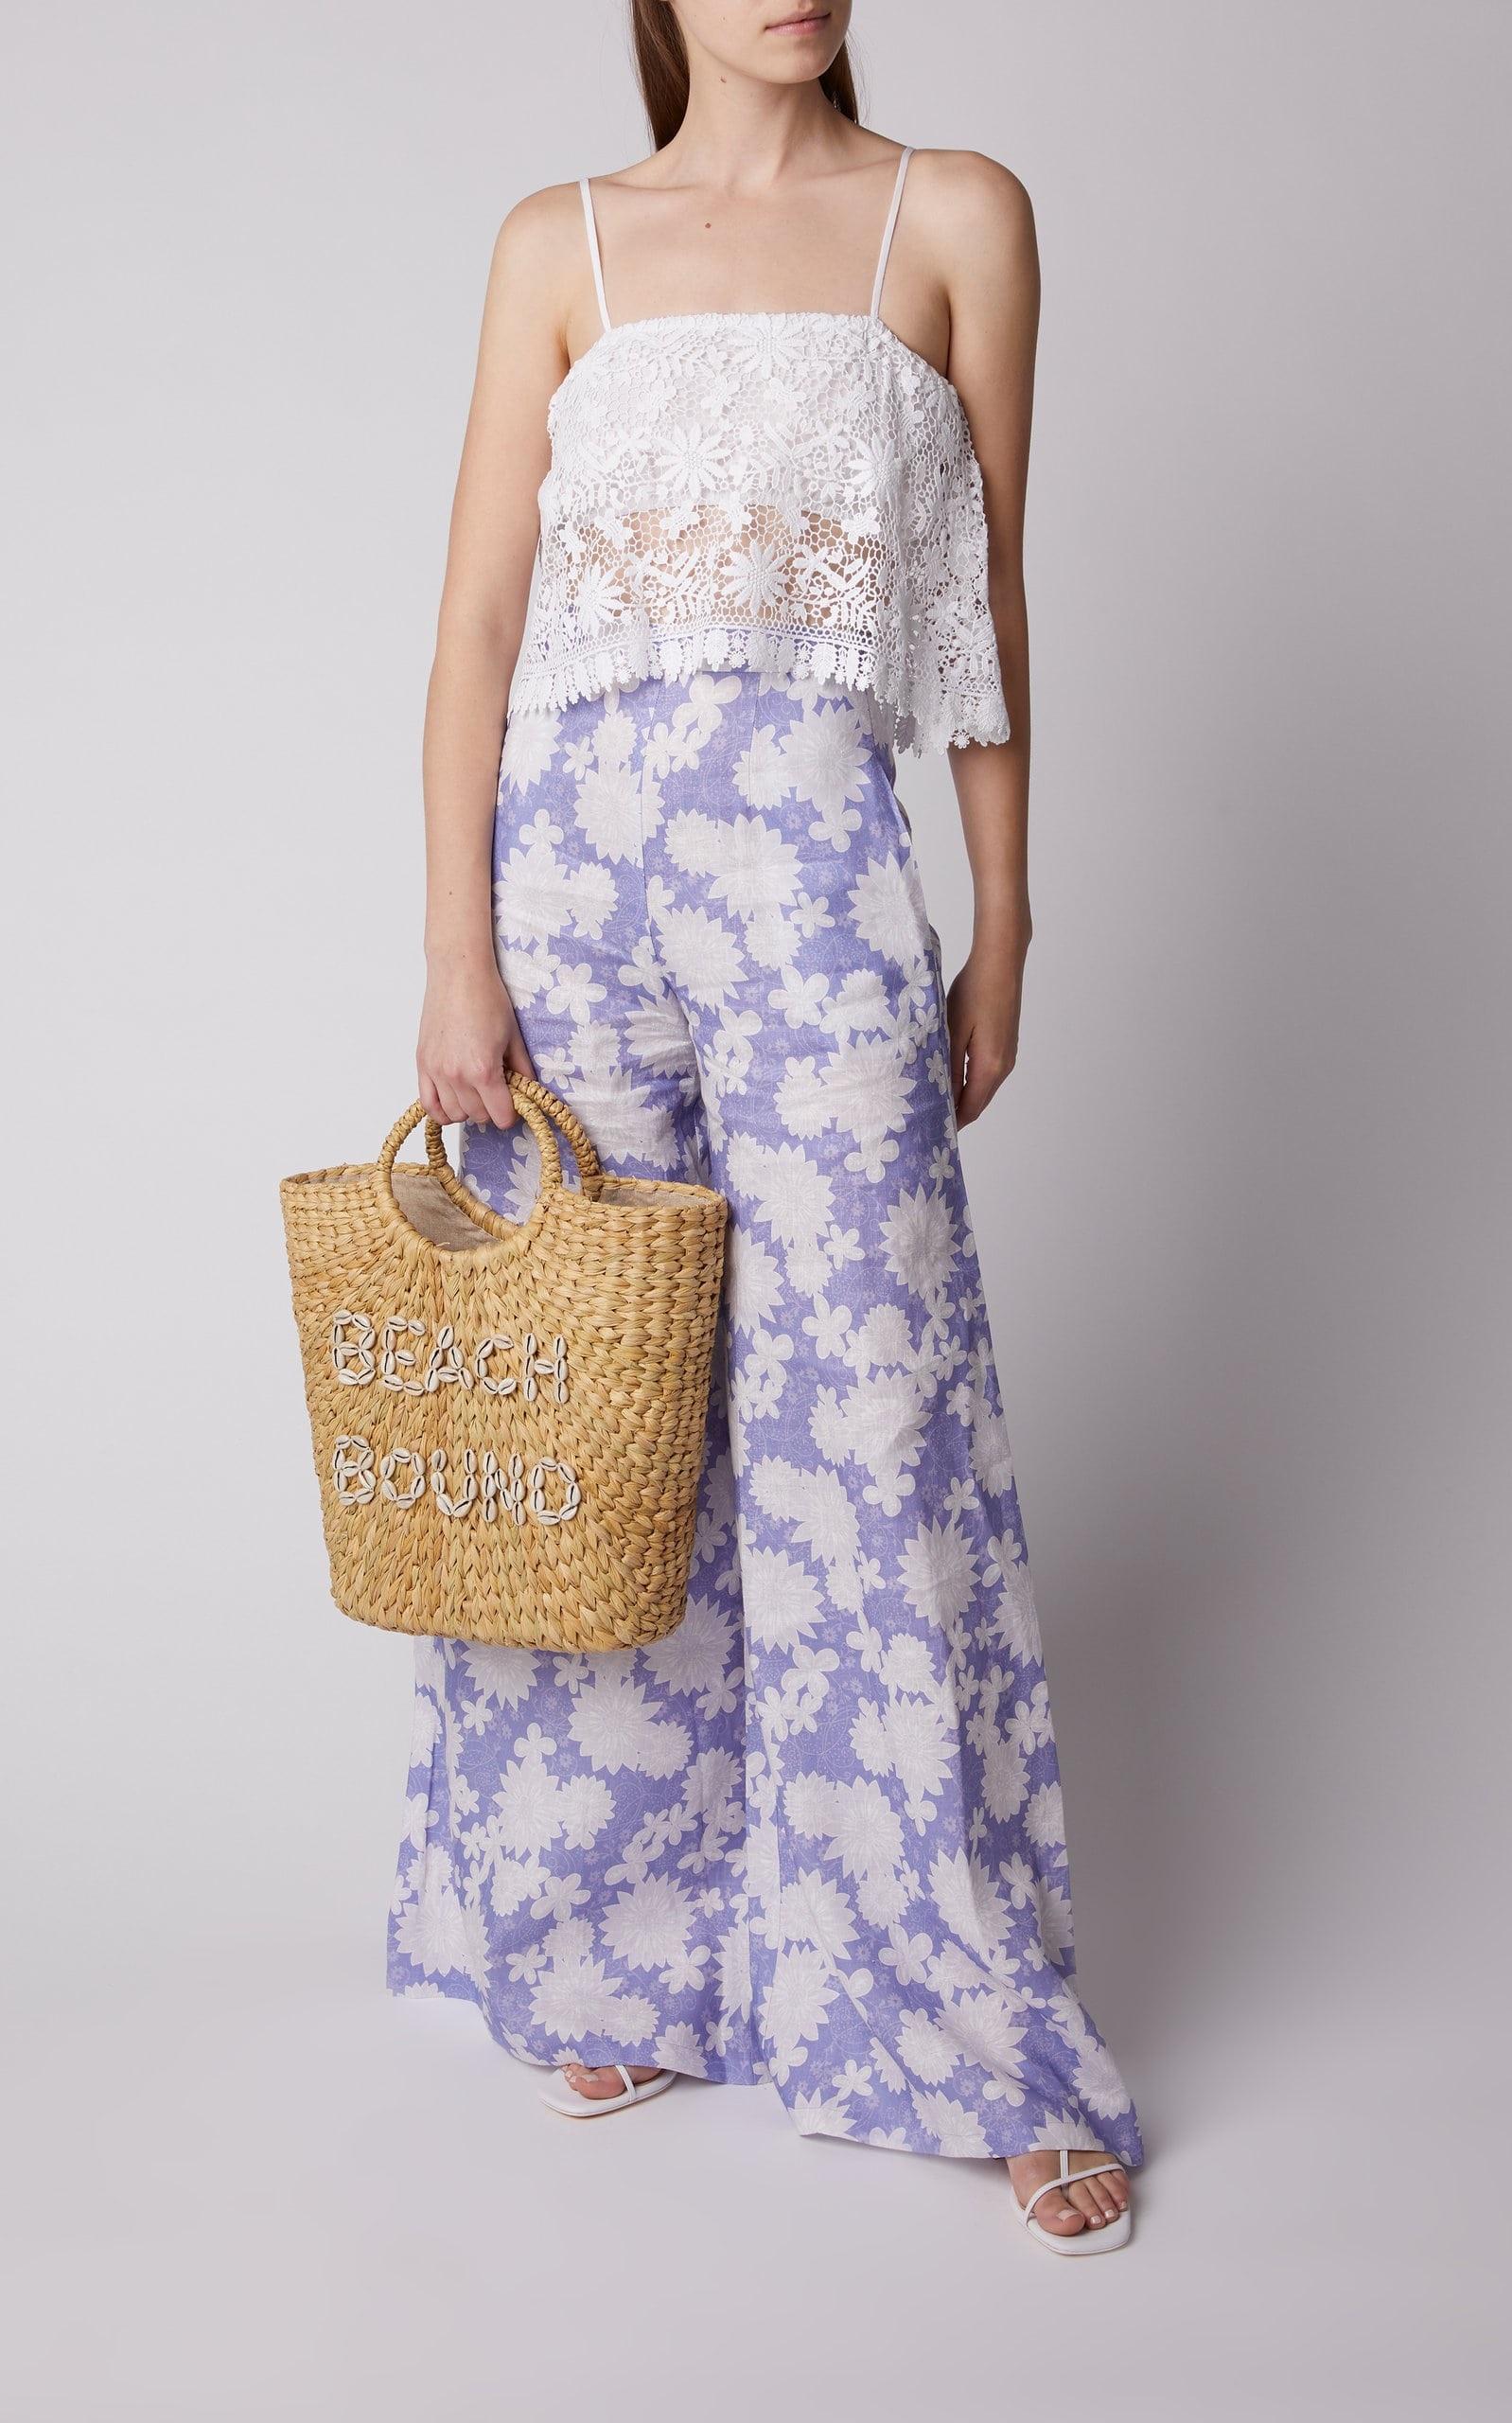 Beach Bag Beauty Essentials, stylish beach bags, Poolside beach bound woven bag